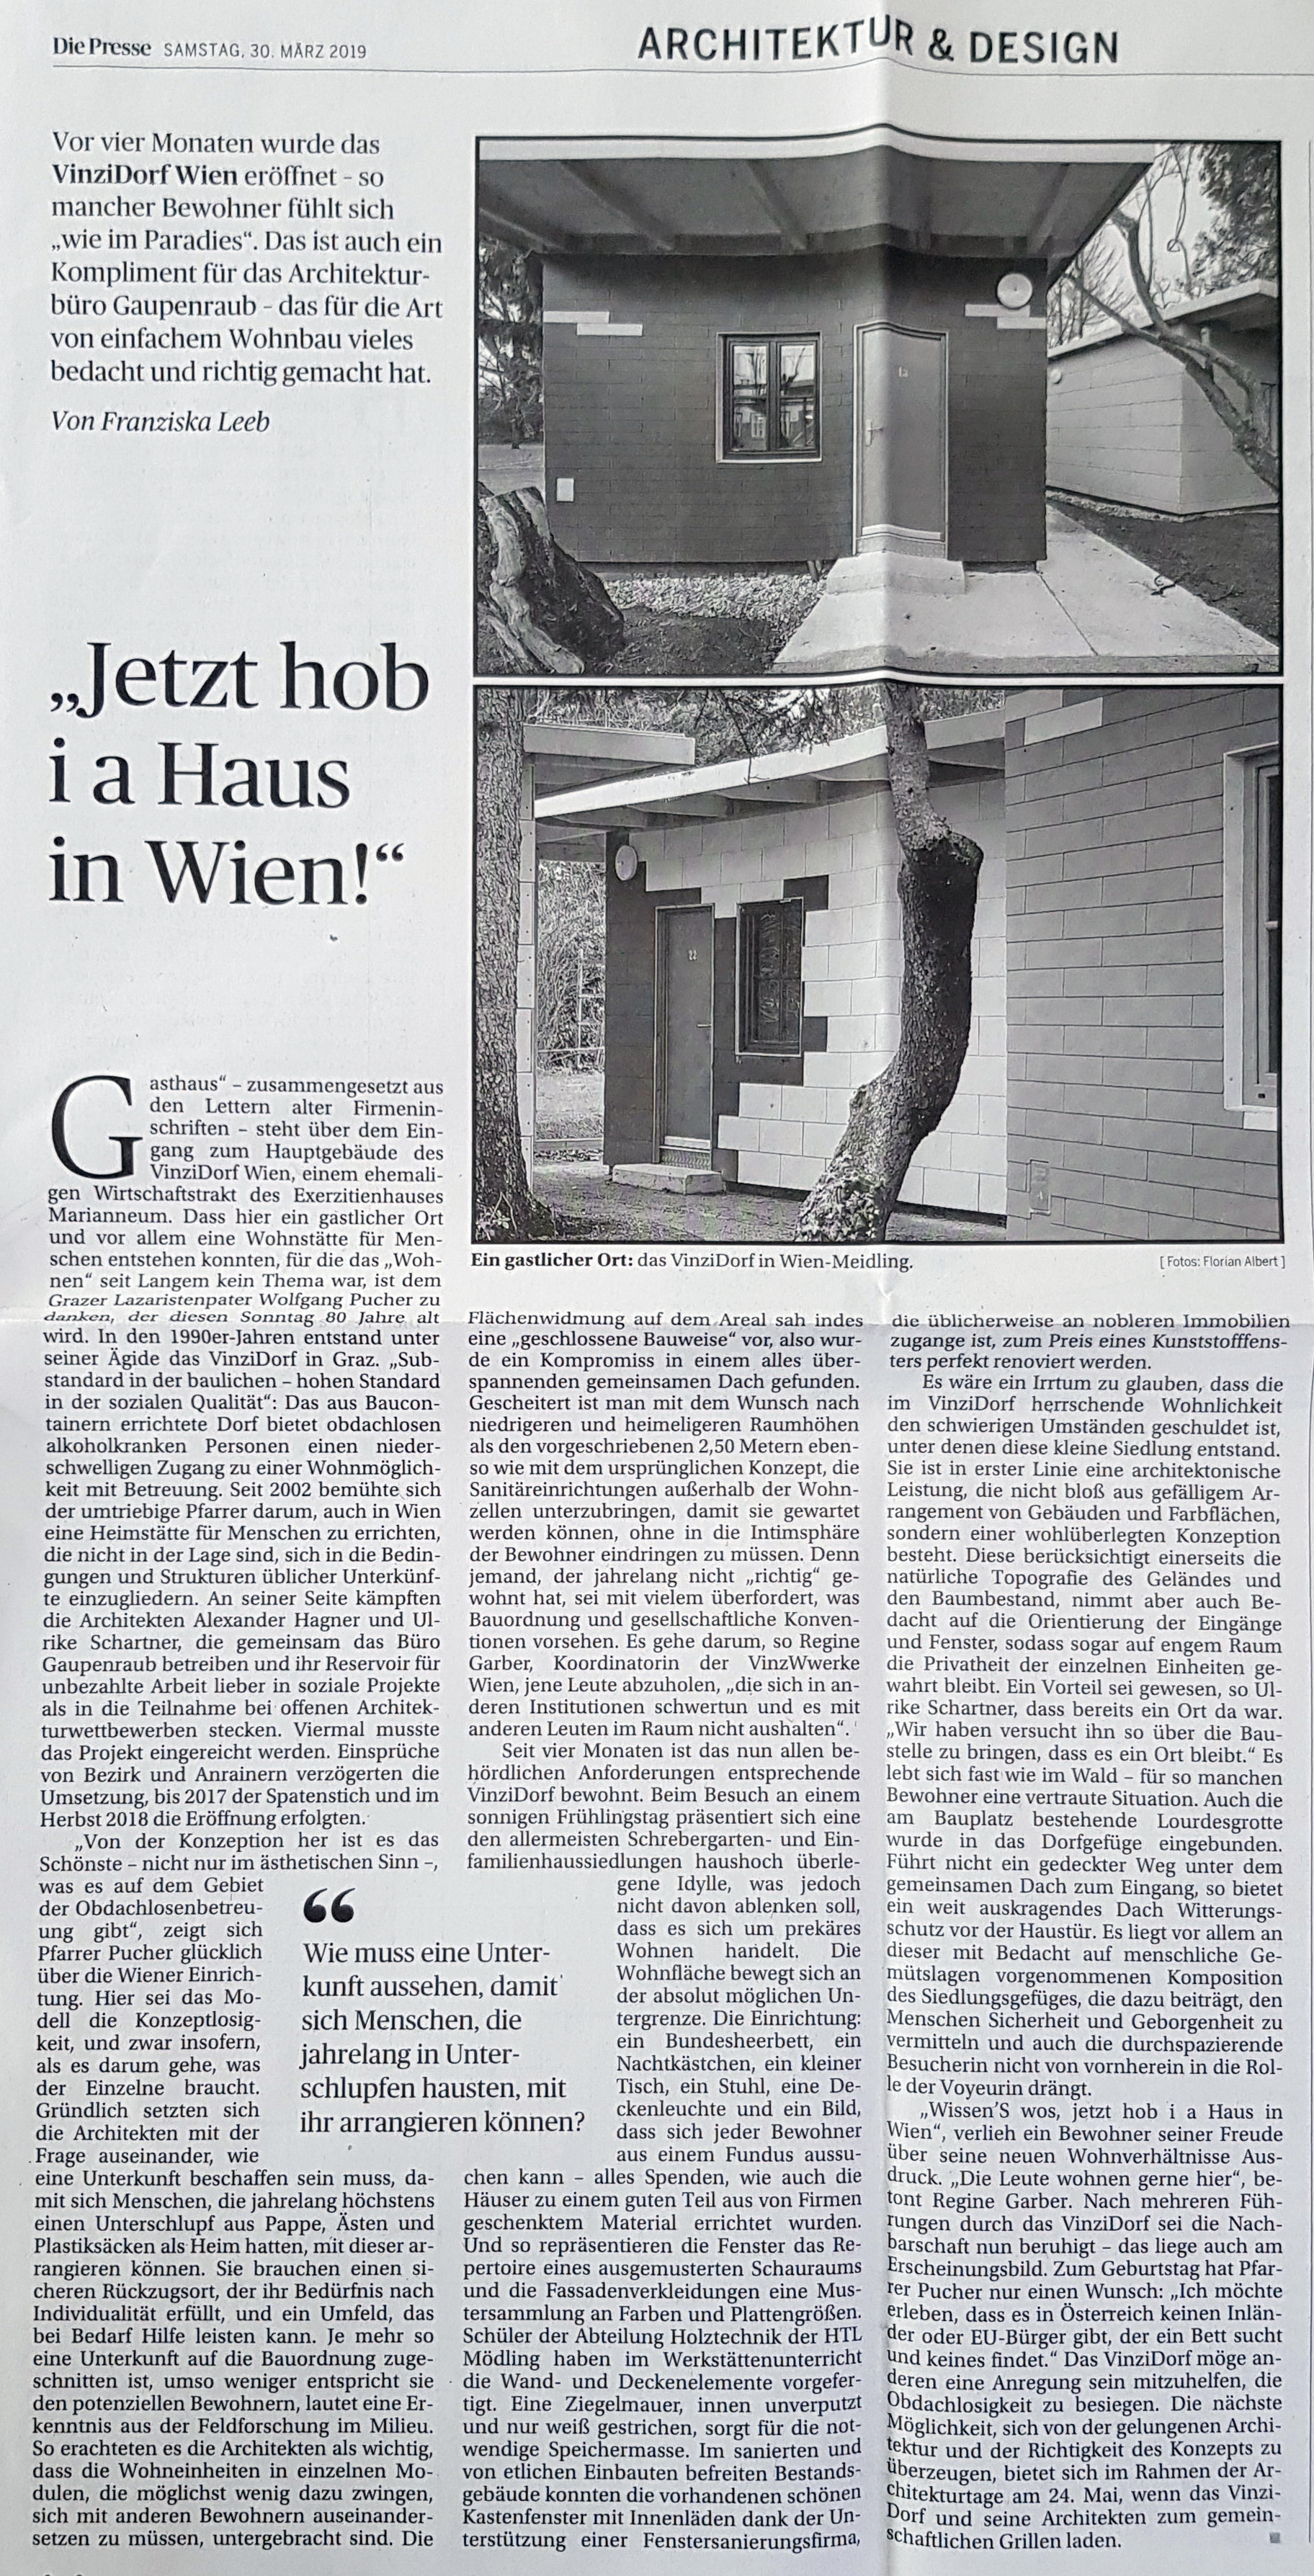 2019 03 30_Die Presse (Franziska Leeb)-b.jpg